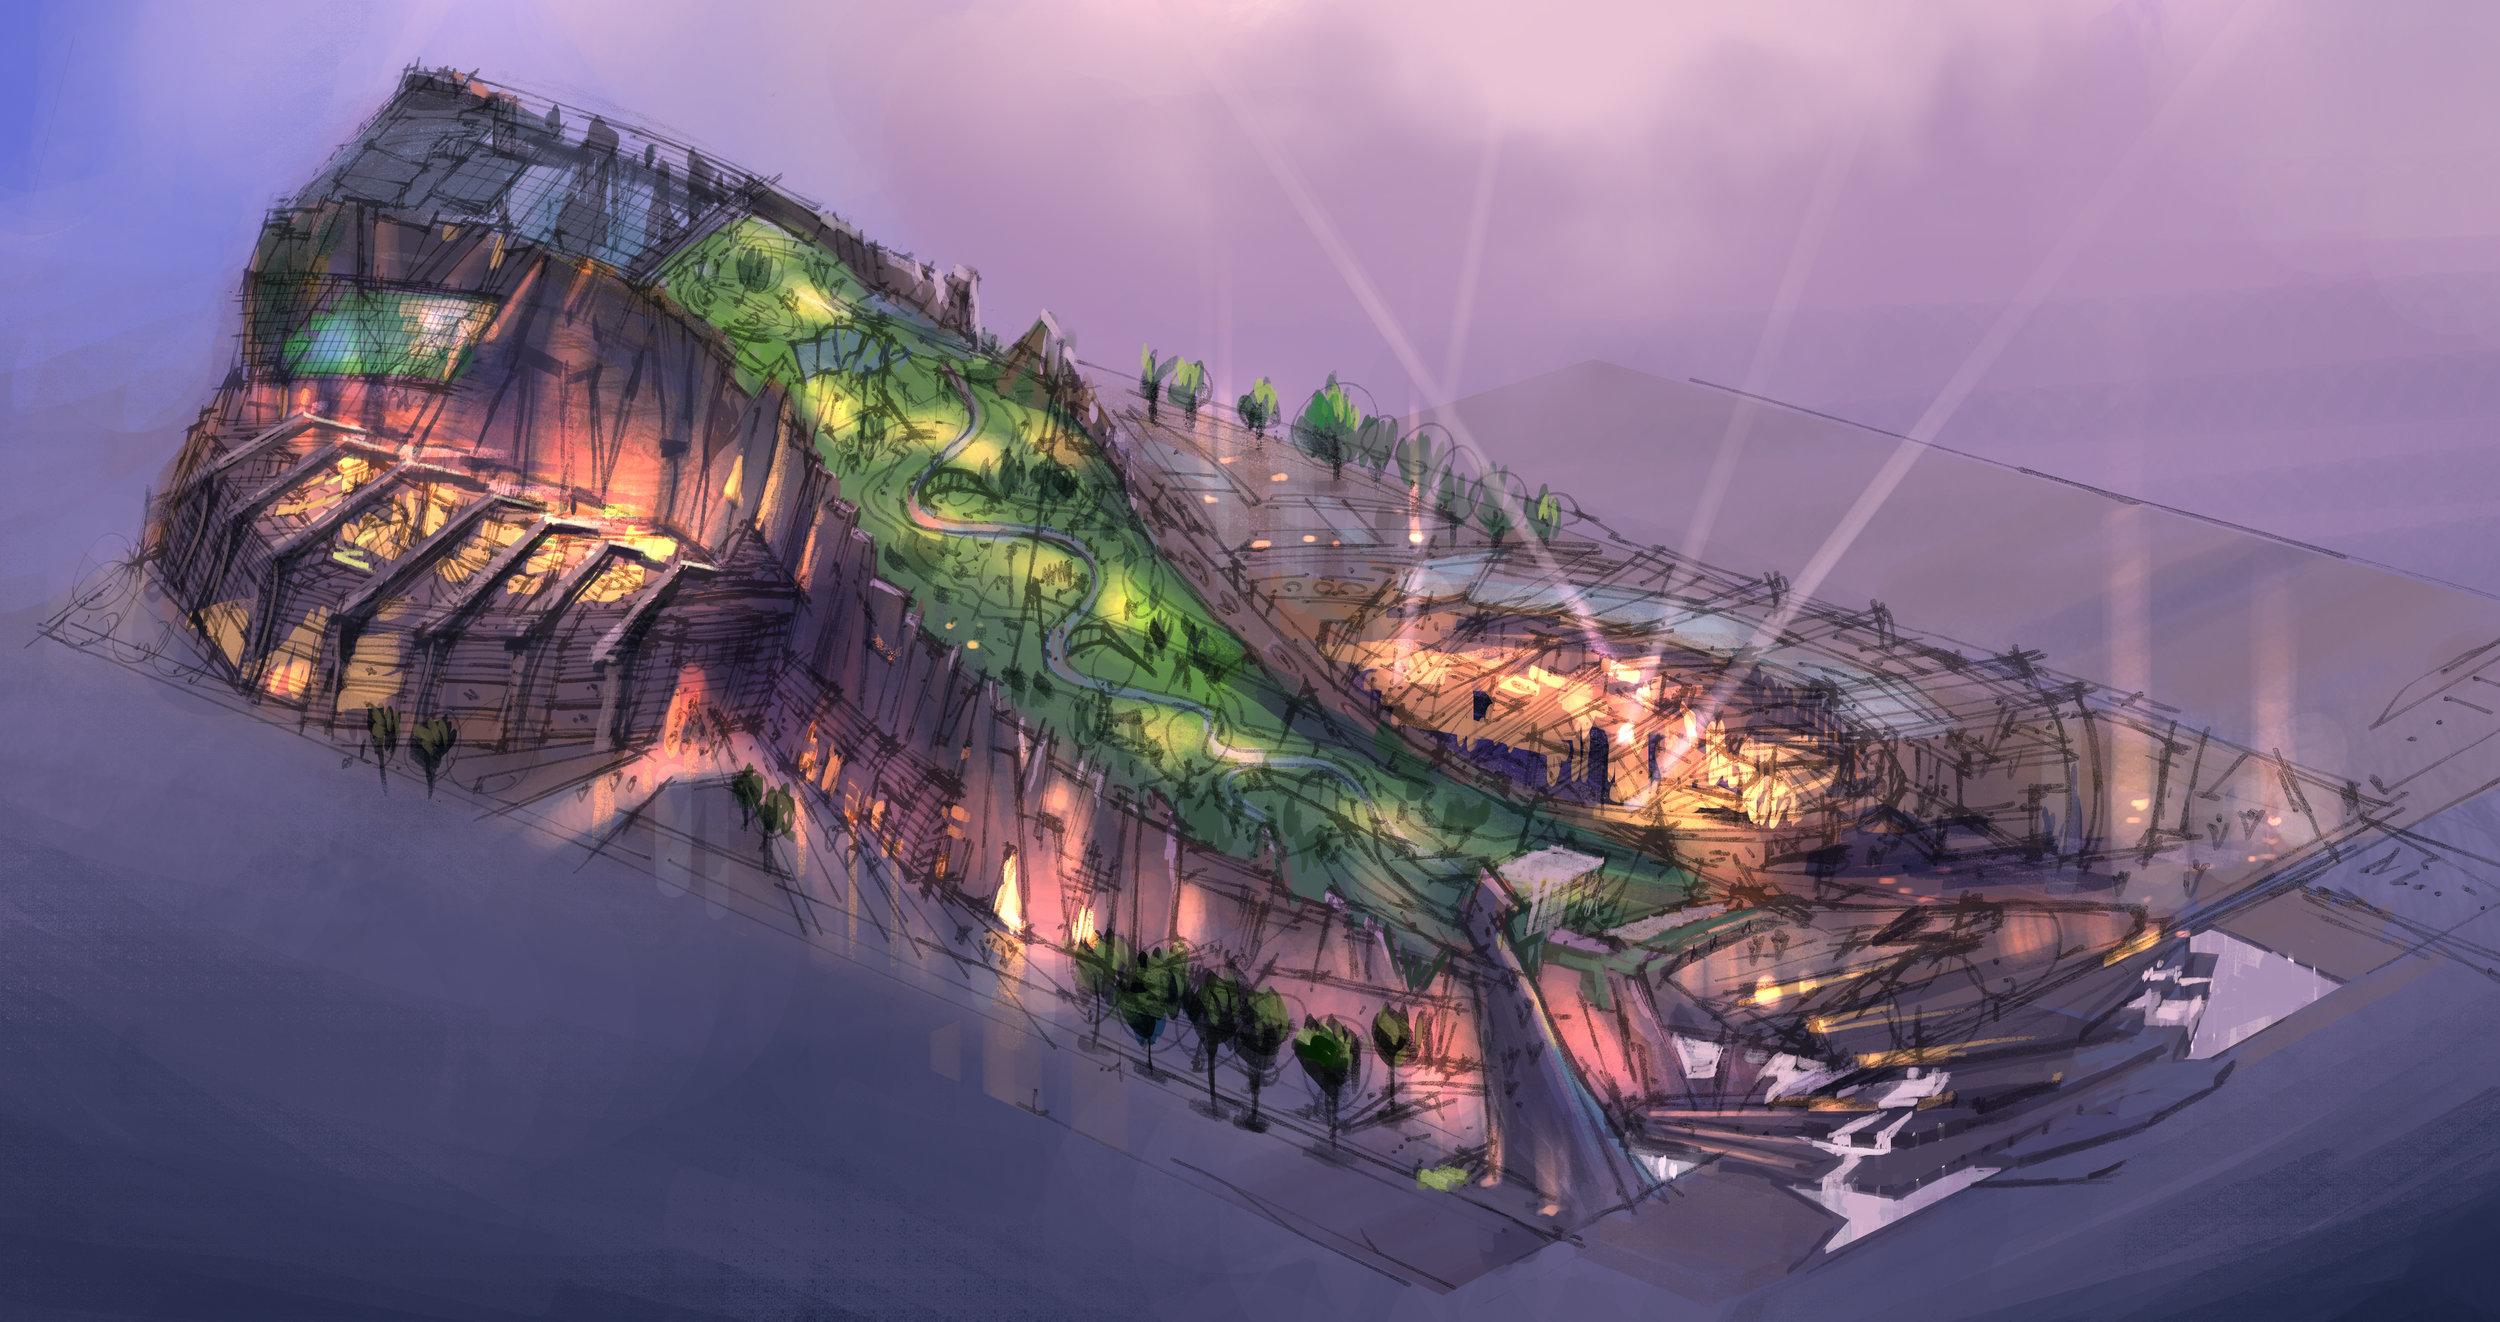 Theme Park Concept: Seoul, Korea